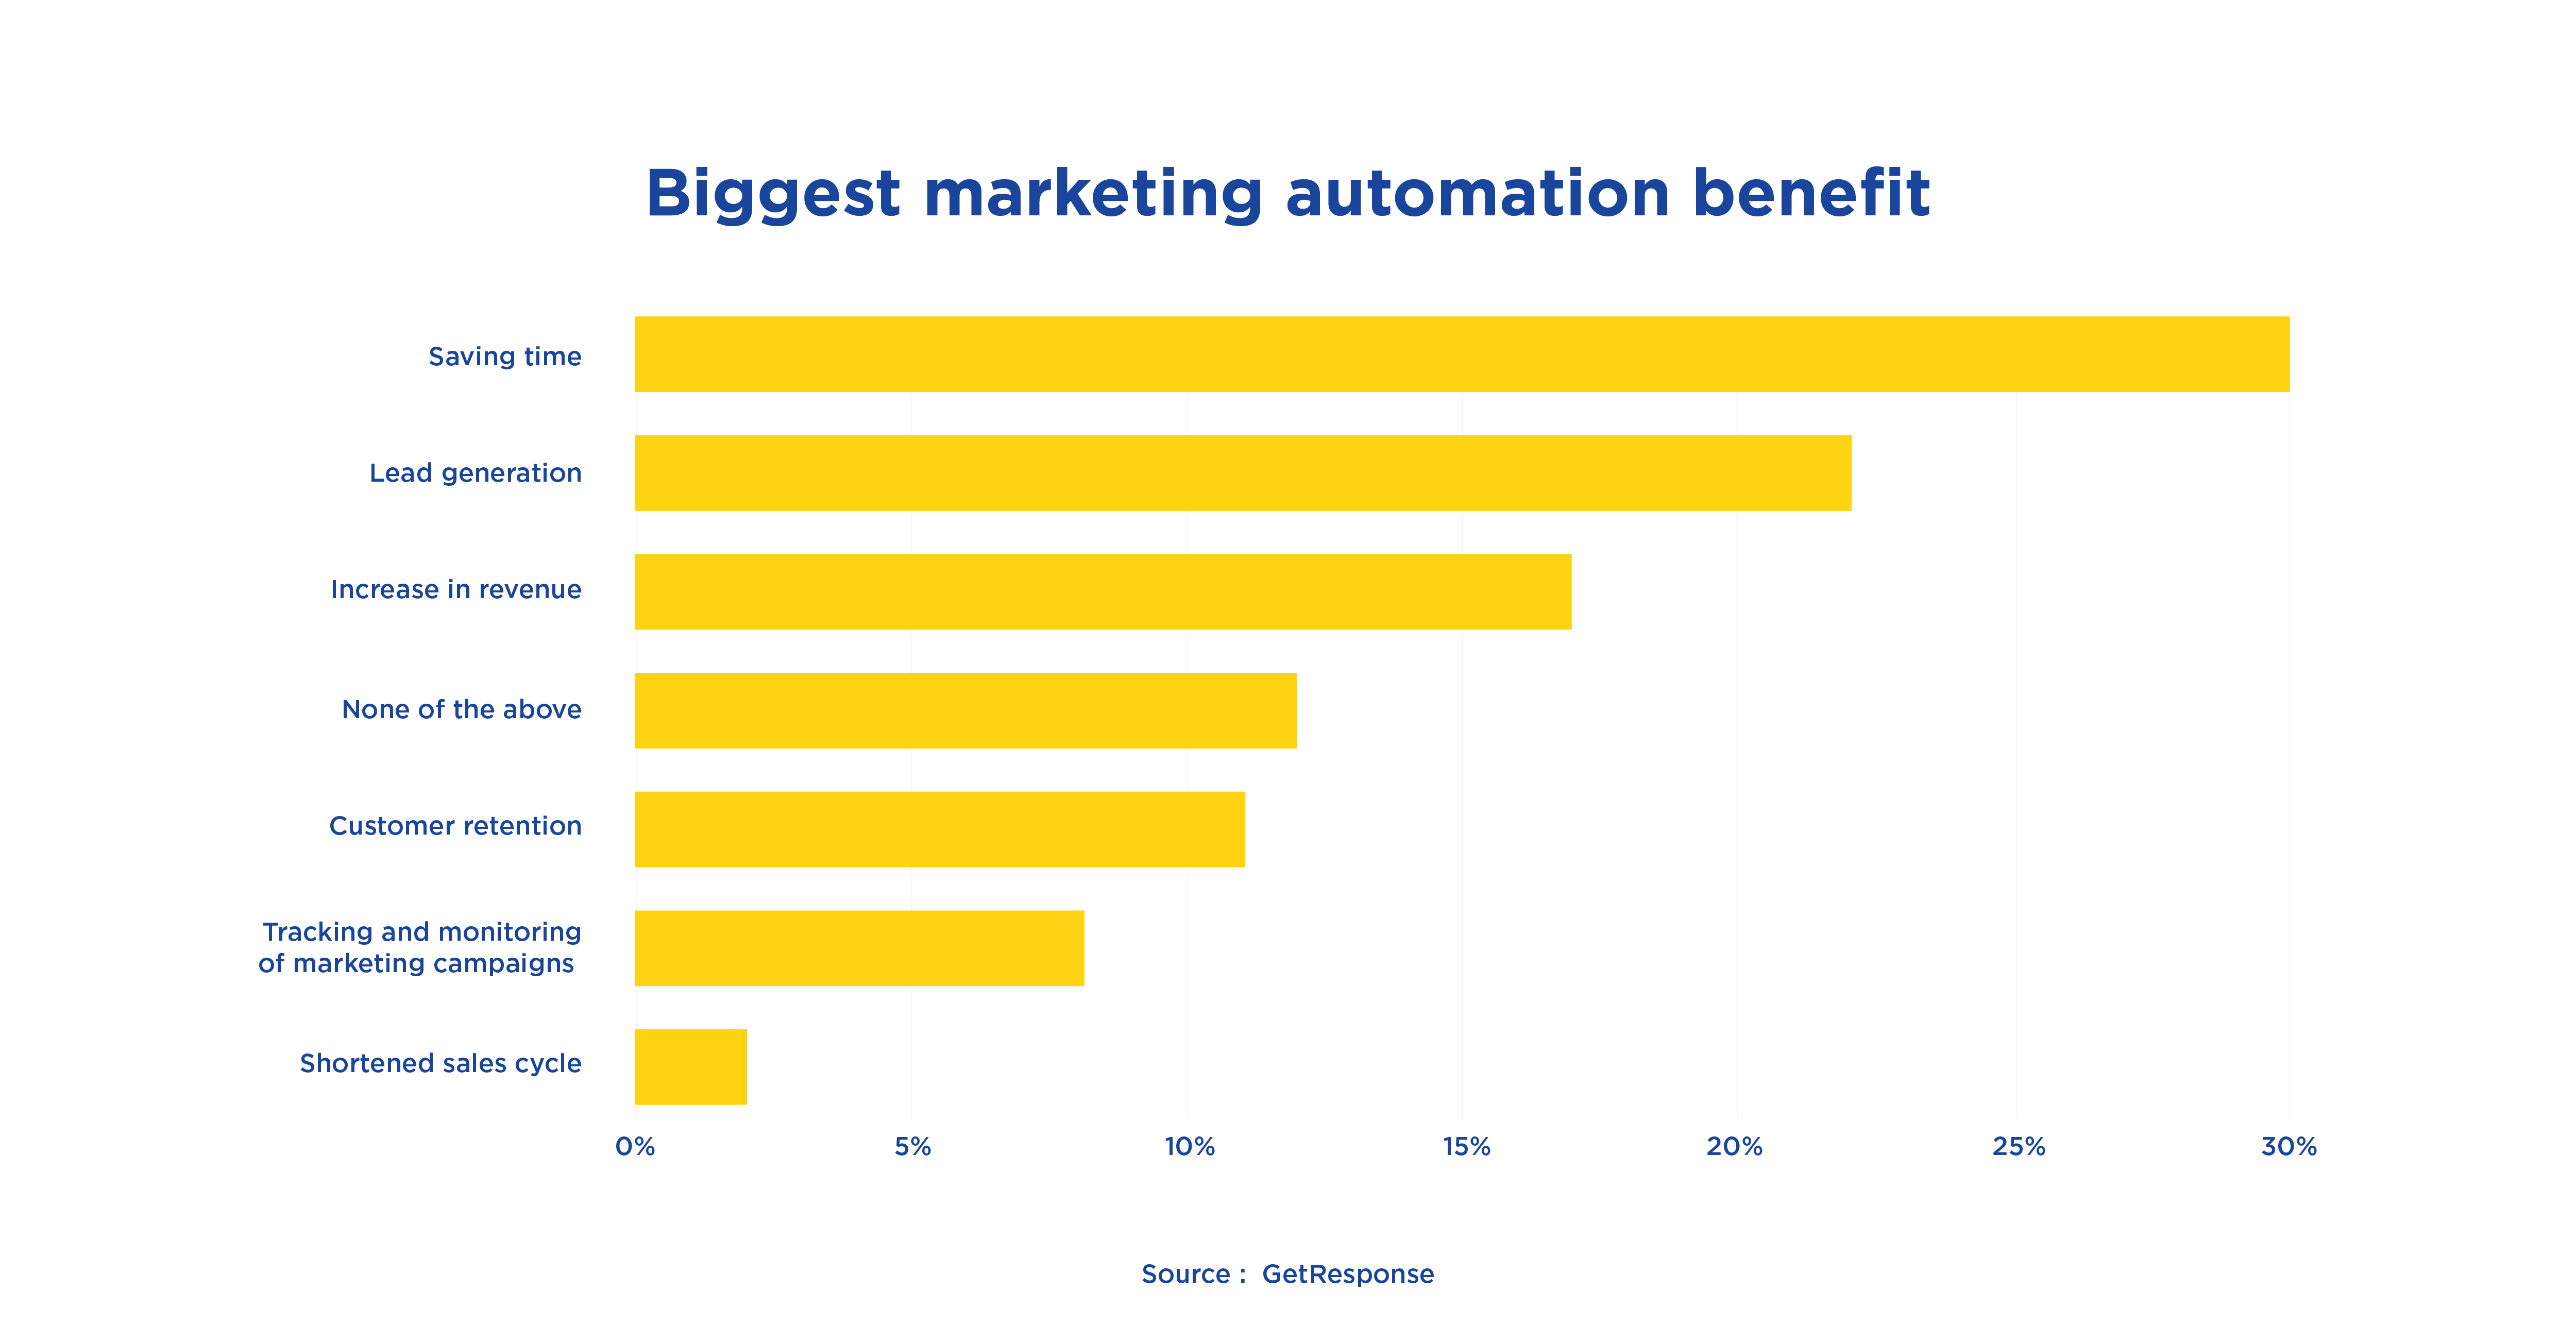 GetResponse Biggest Marketing Automation Benefit